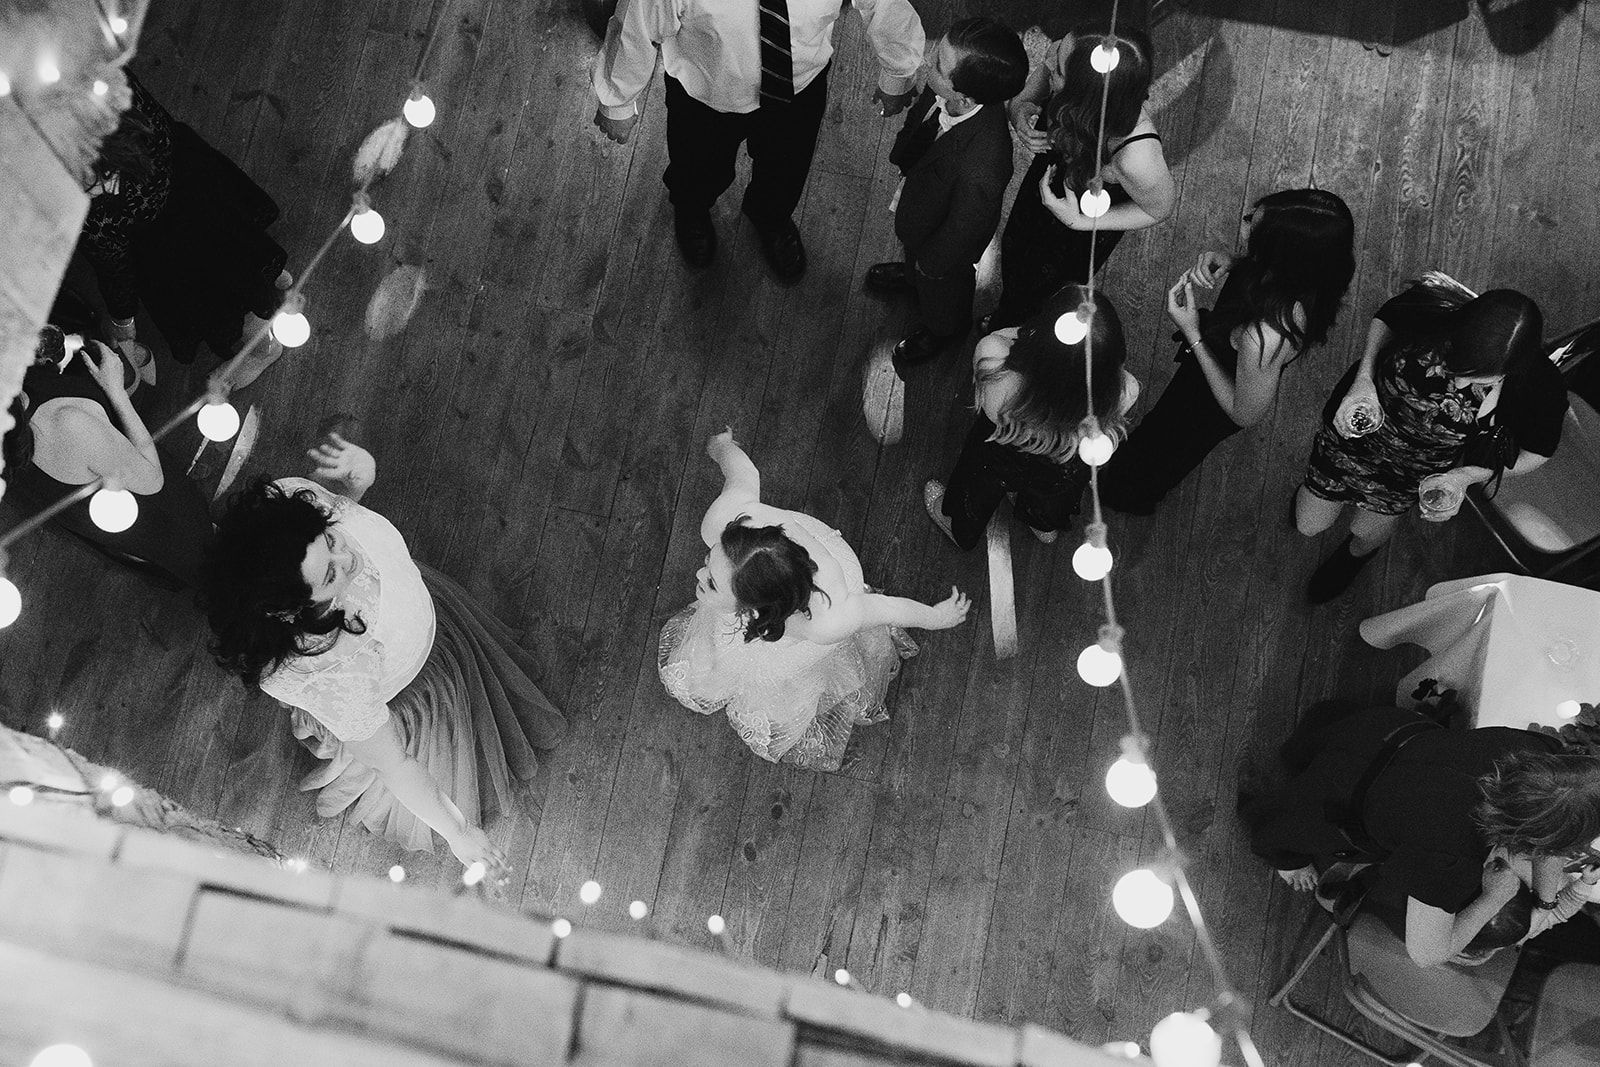 barn at evergreen colorado wedding 829_websize.jpg